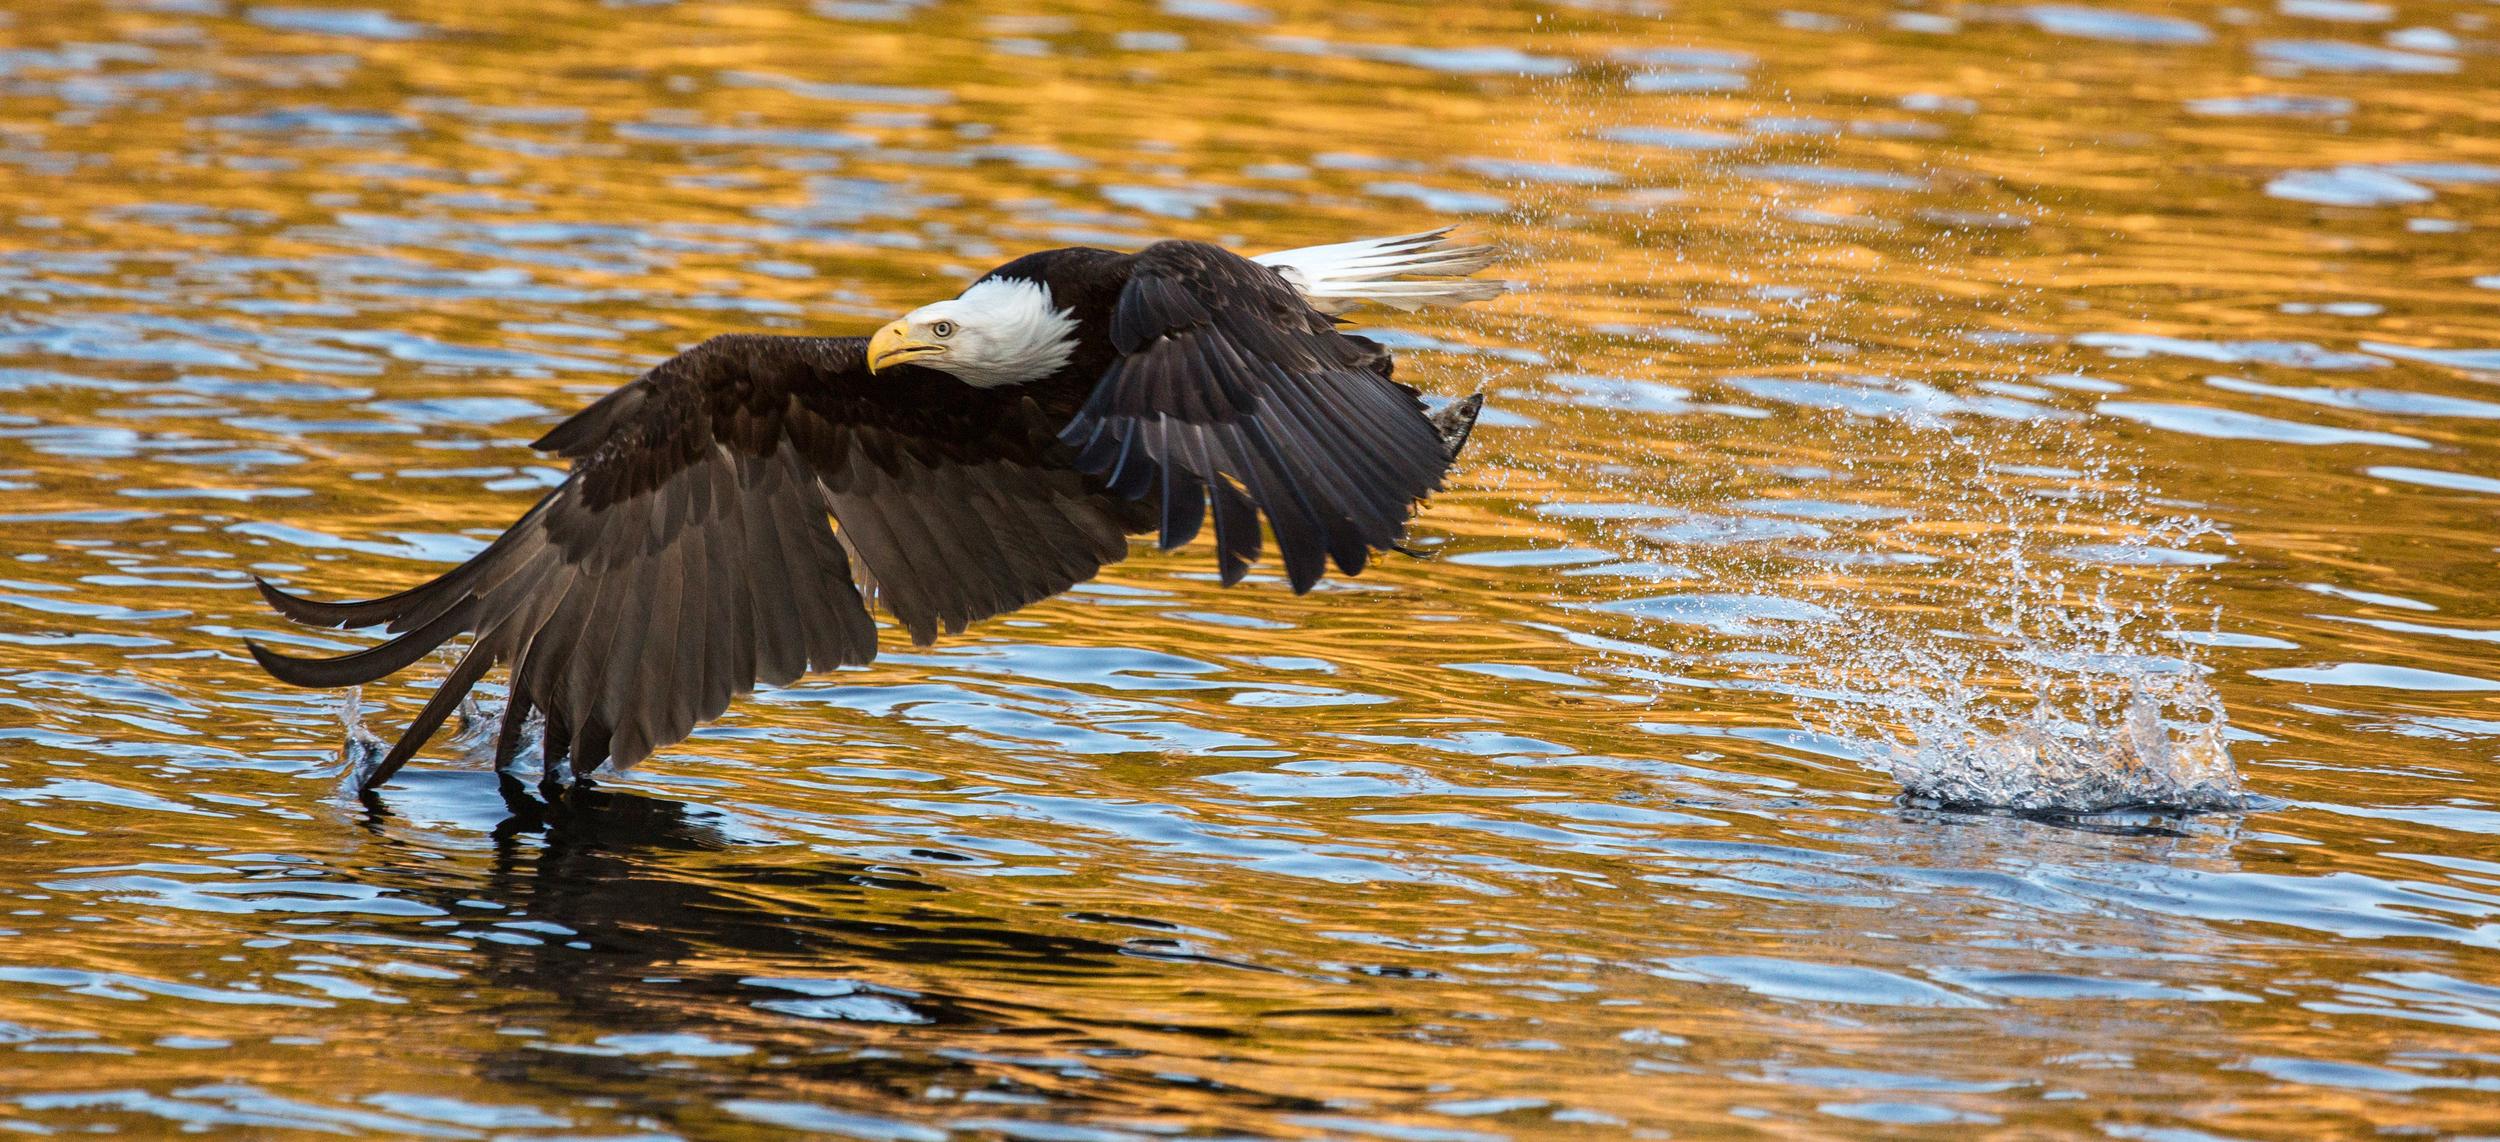 Rick Sammon's Birds012.jpg